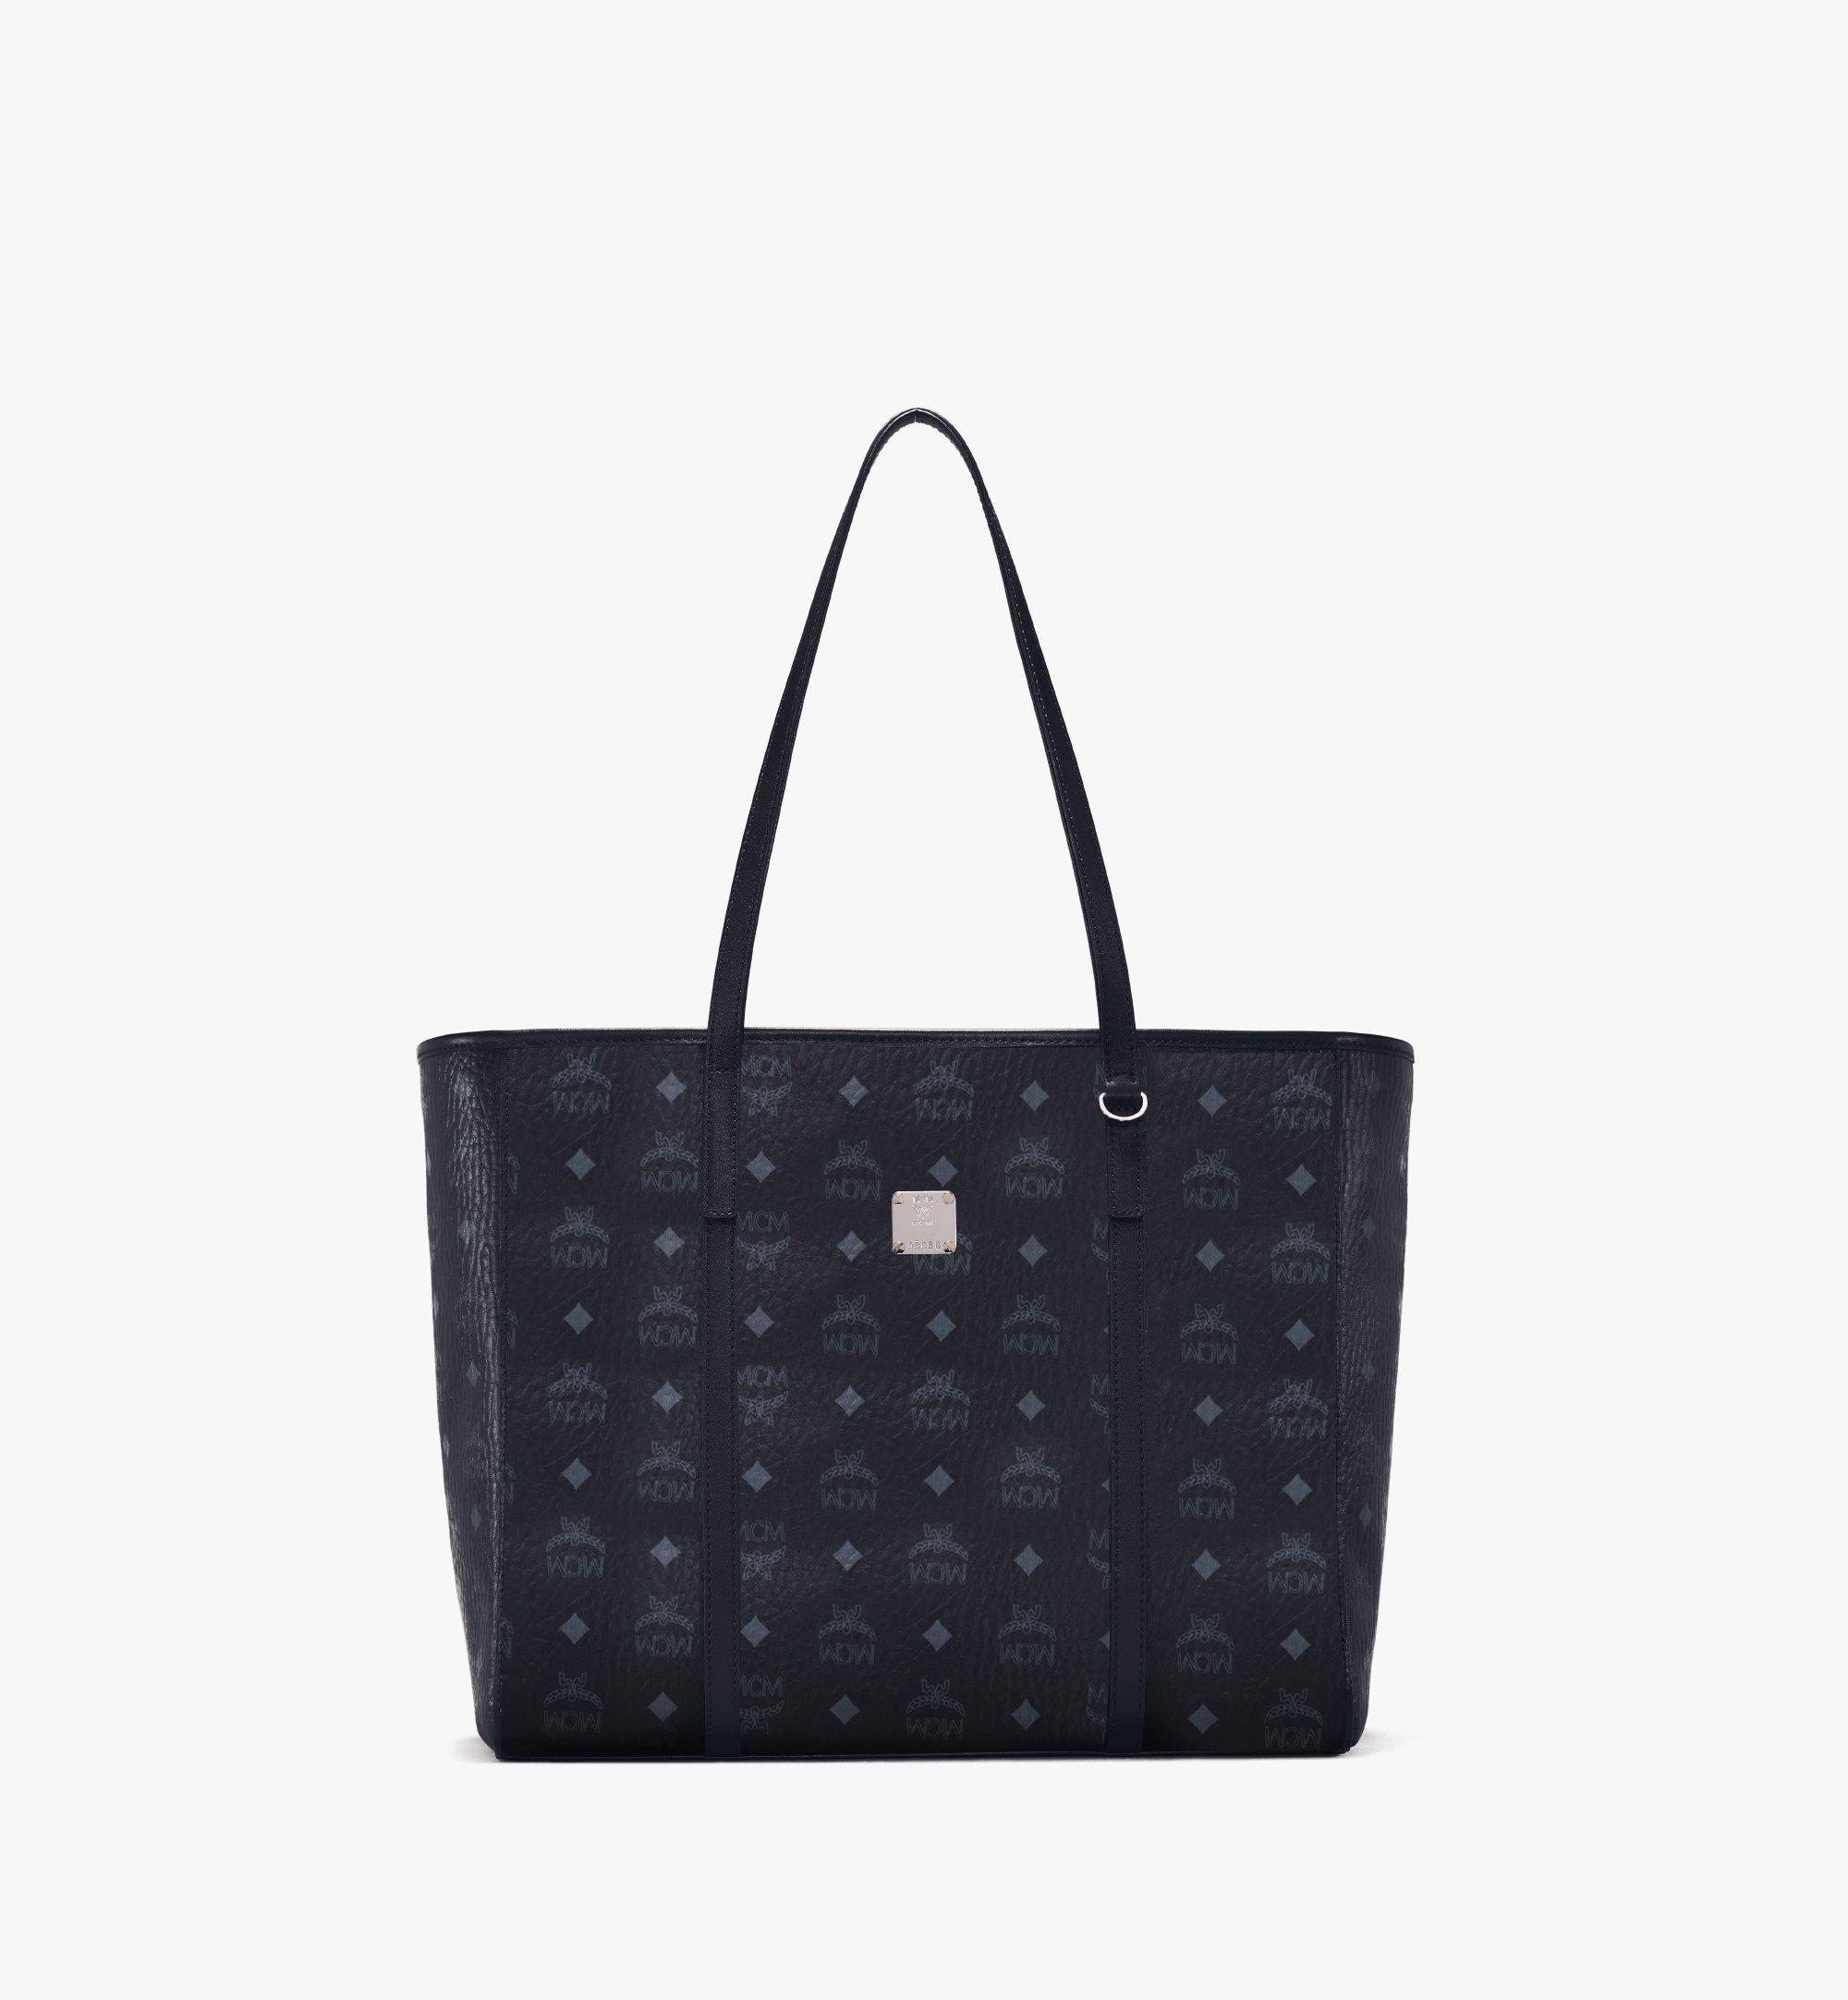 MCM Toni E/W Shopper in Visetos Black MWPAATN01BK001 Alternate View 1